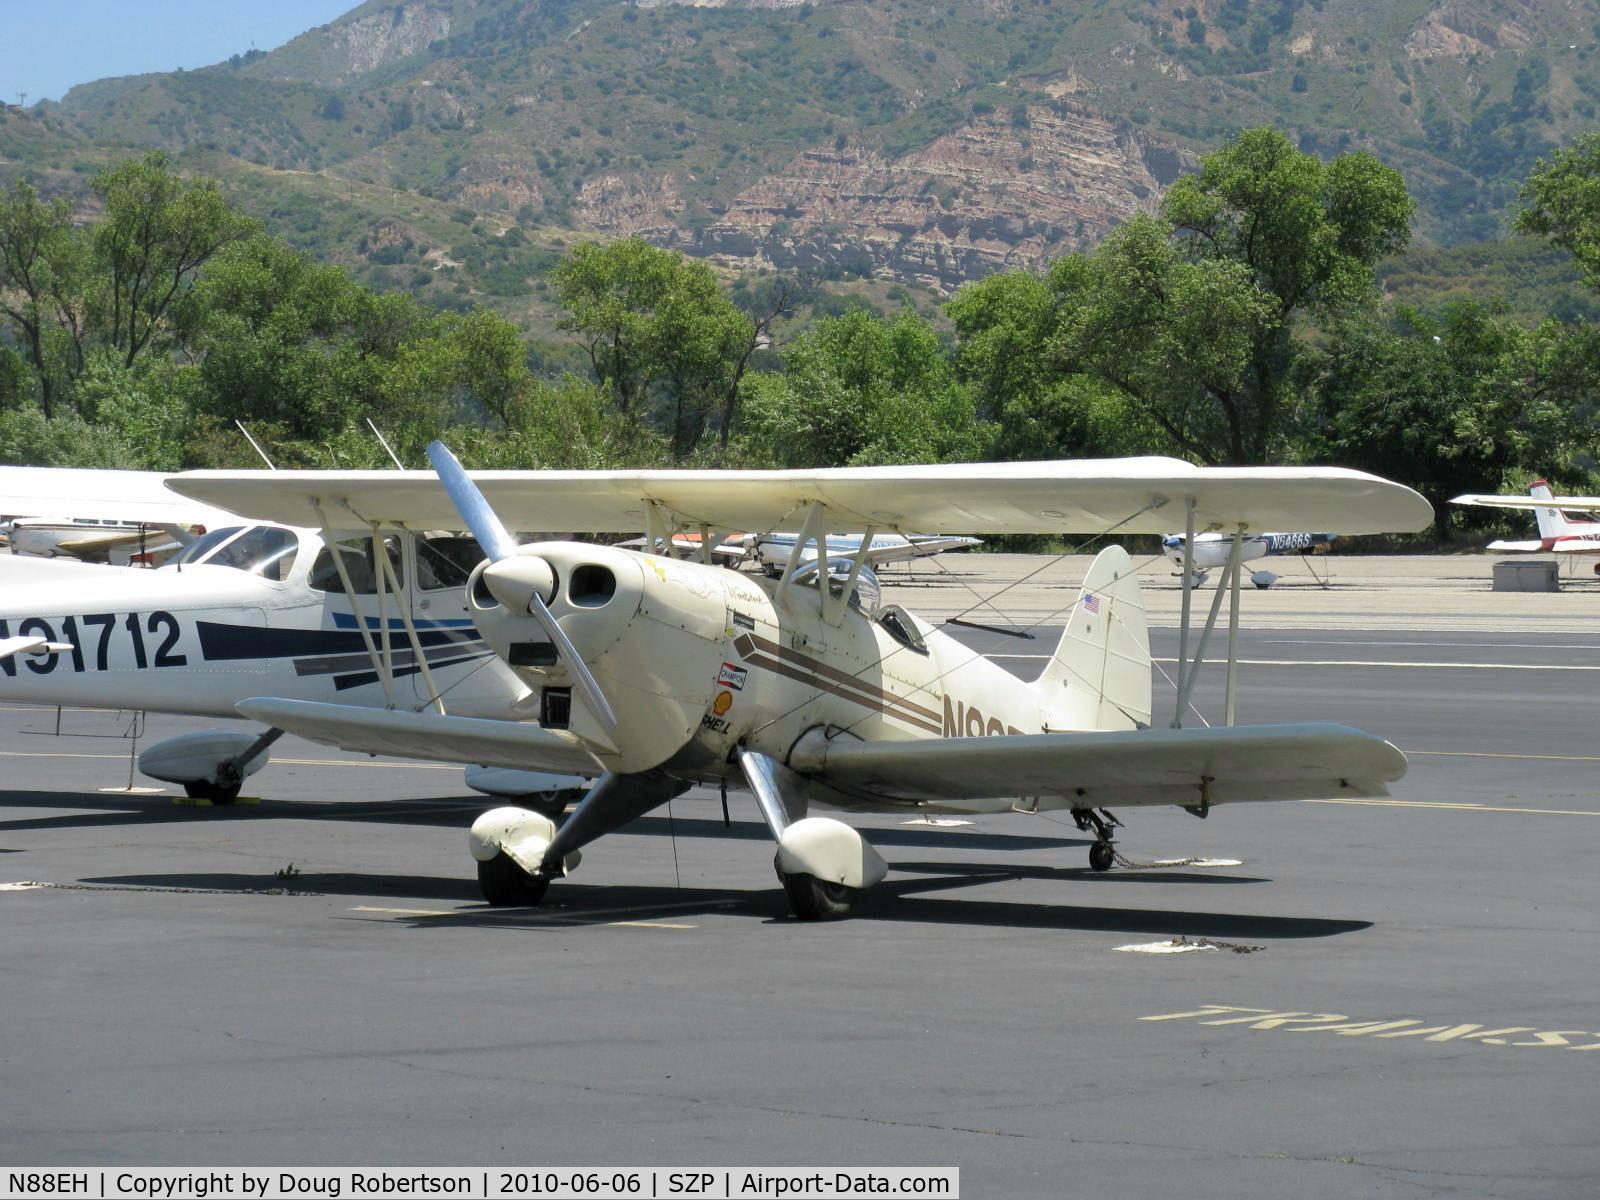 N88EH, 1970 EAA Biplane C/N EHH-1, 1970 Hooper EAA BIPLANE, Model P ACRO-SPORT, 'Woodstock', Lycoming O-290 135 Hp